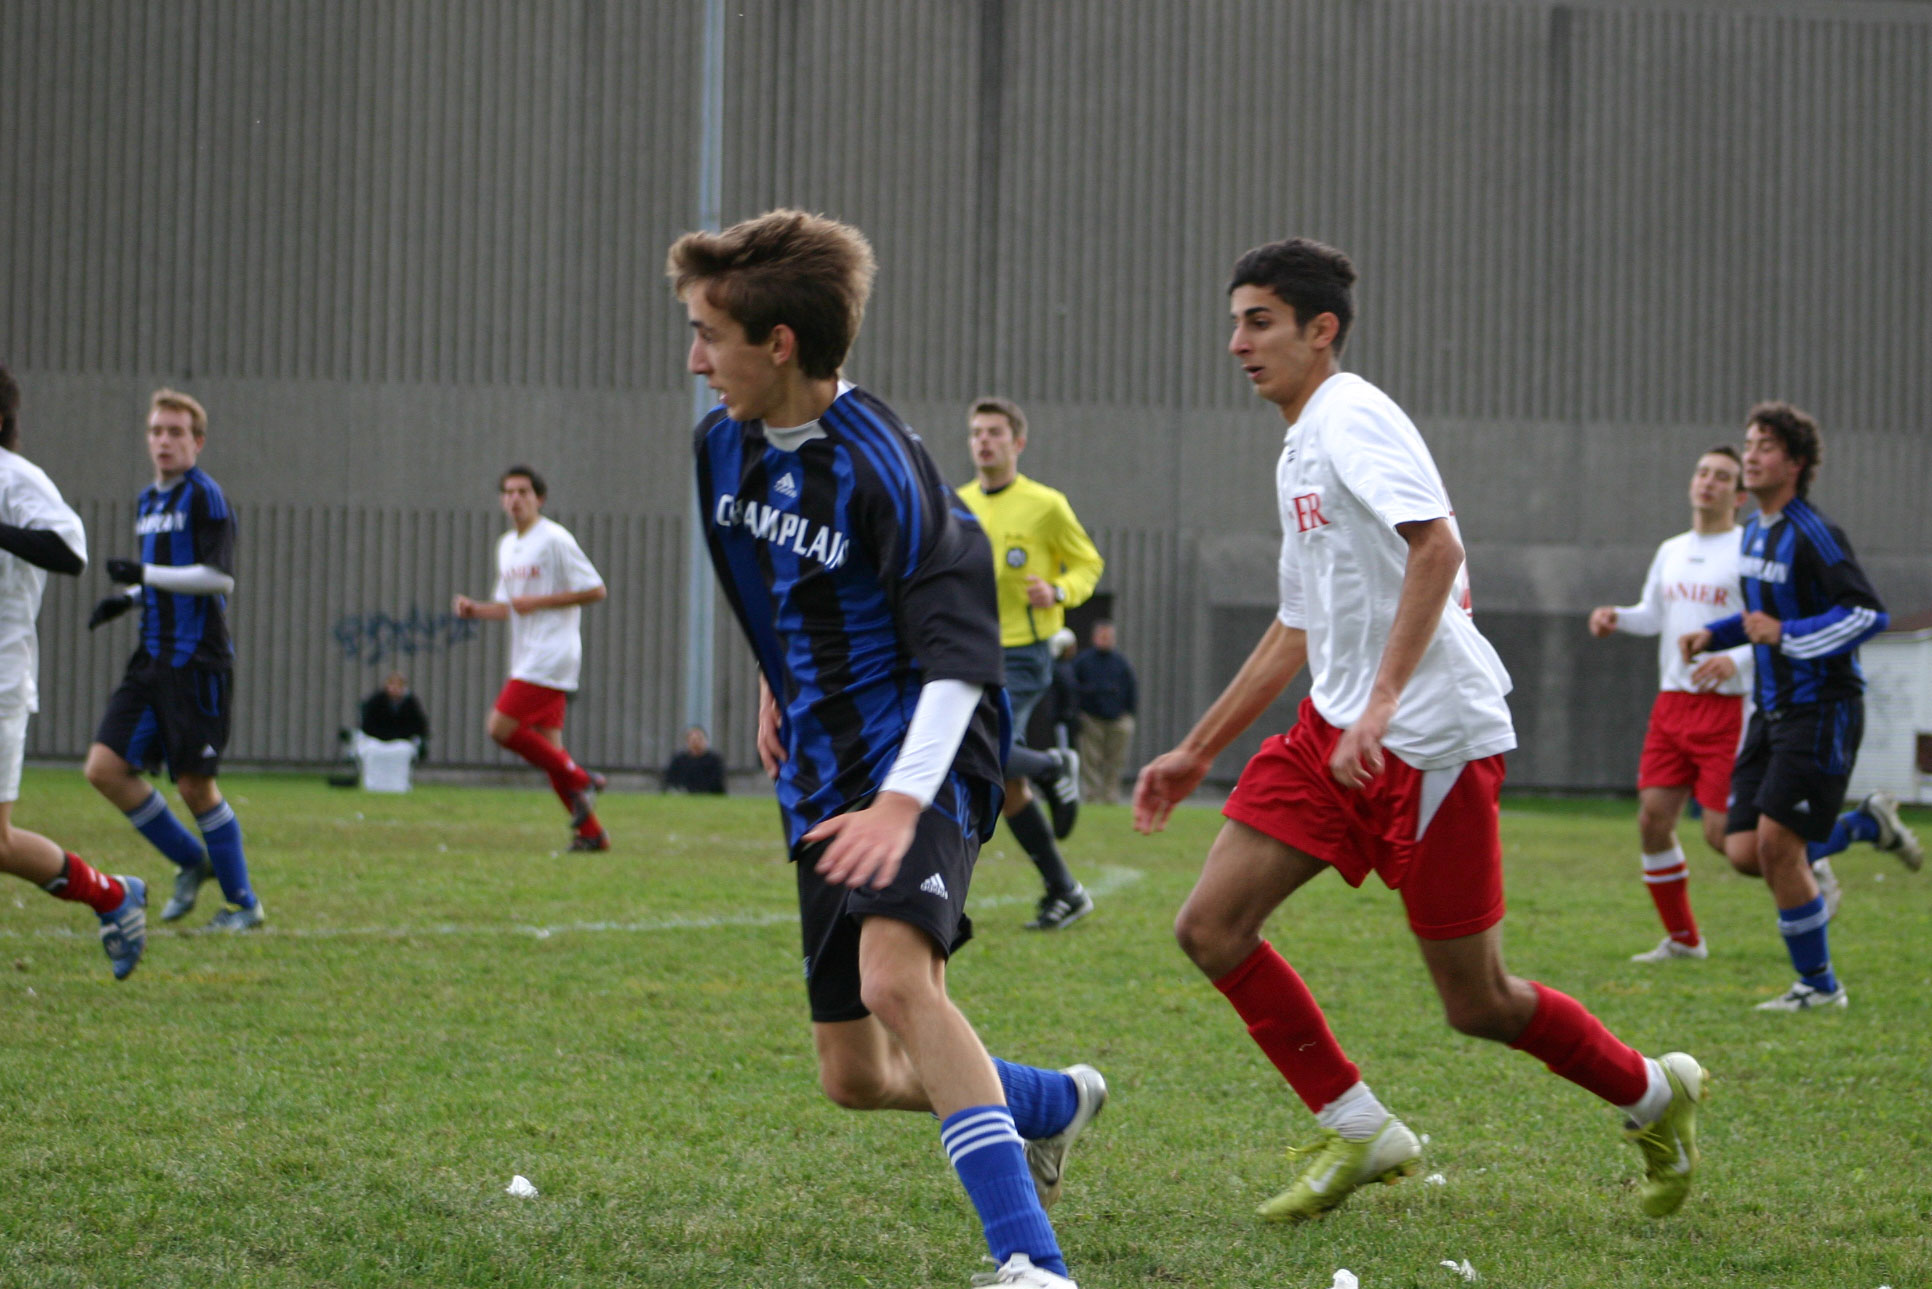 2008 Cheetahs: Men's Soccer Photos